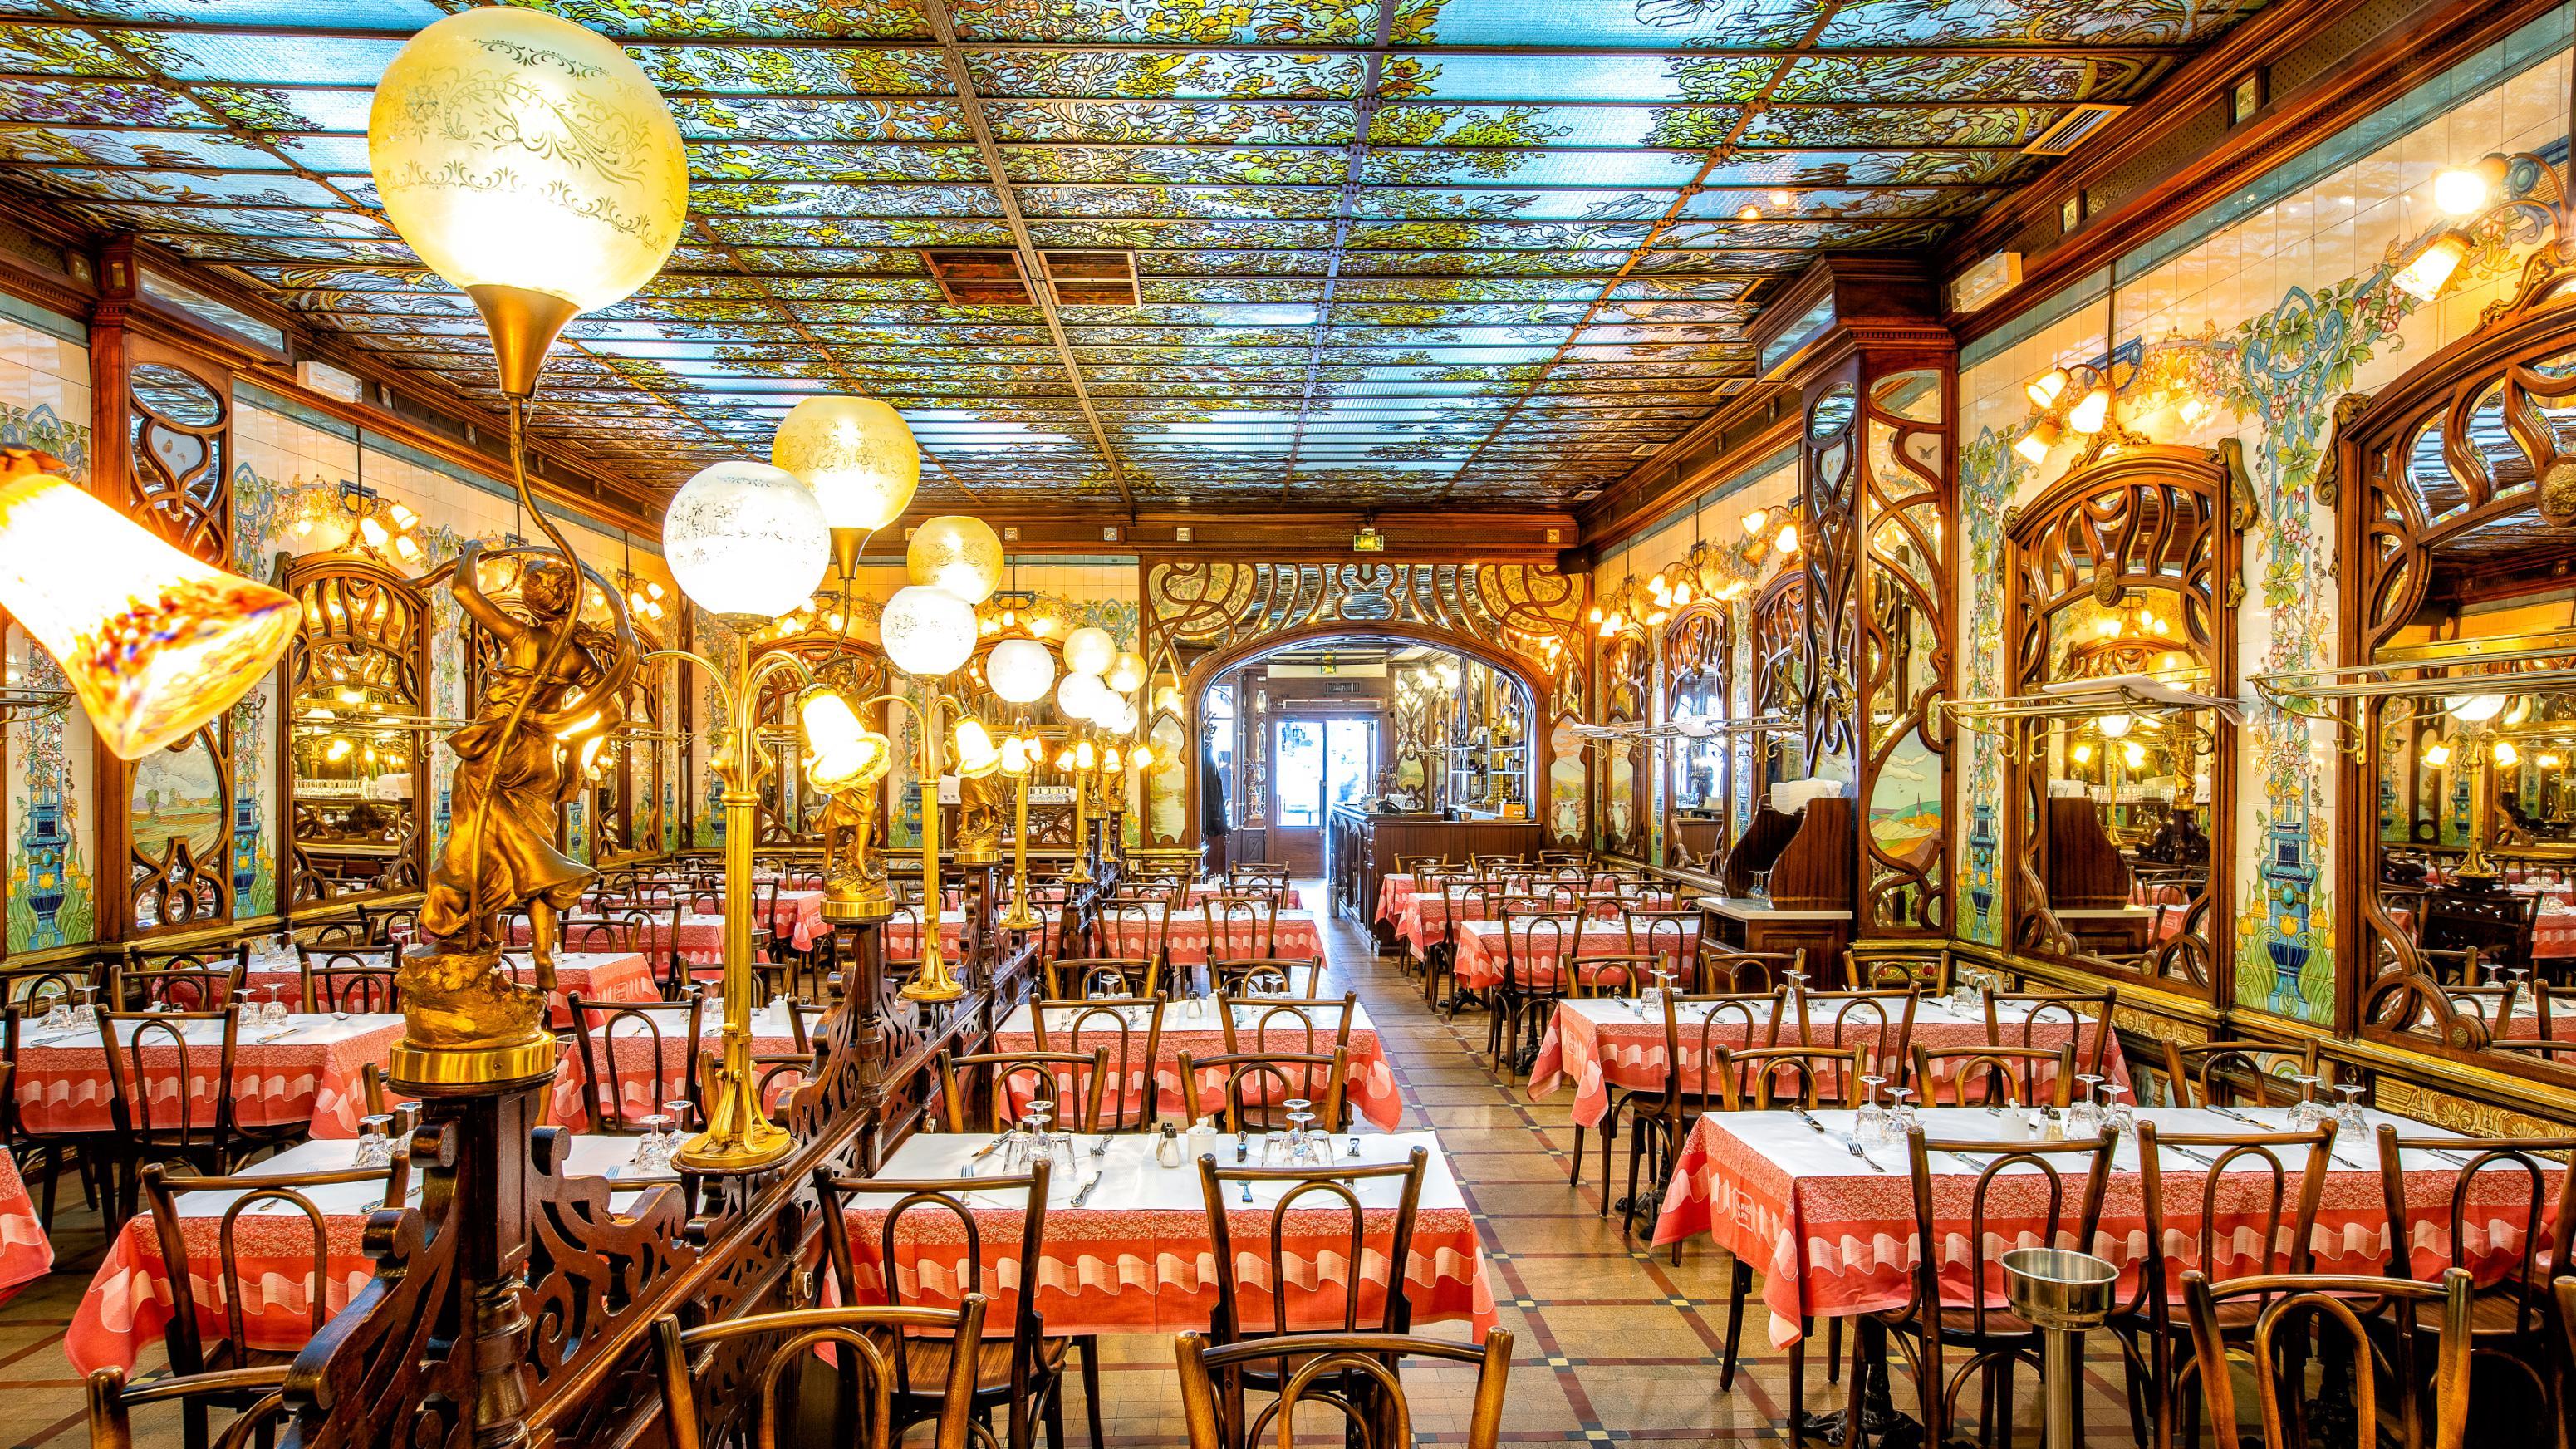 Bouillon restaurants of Paris serve retro French classics at bargain ...